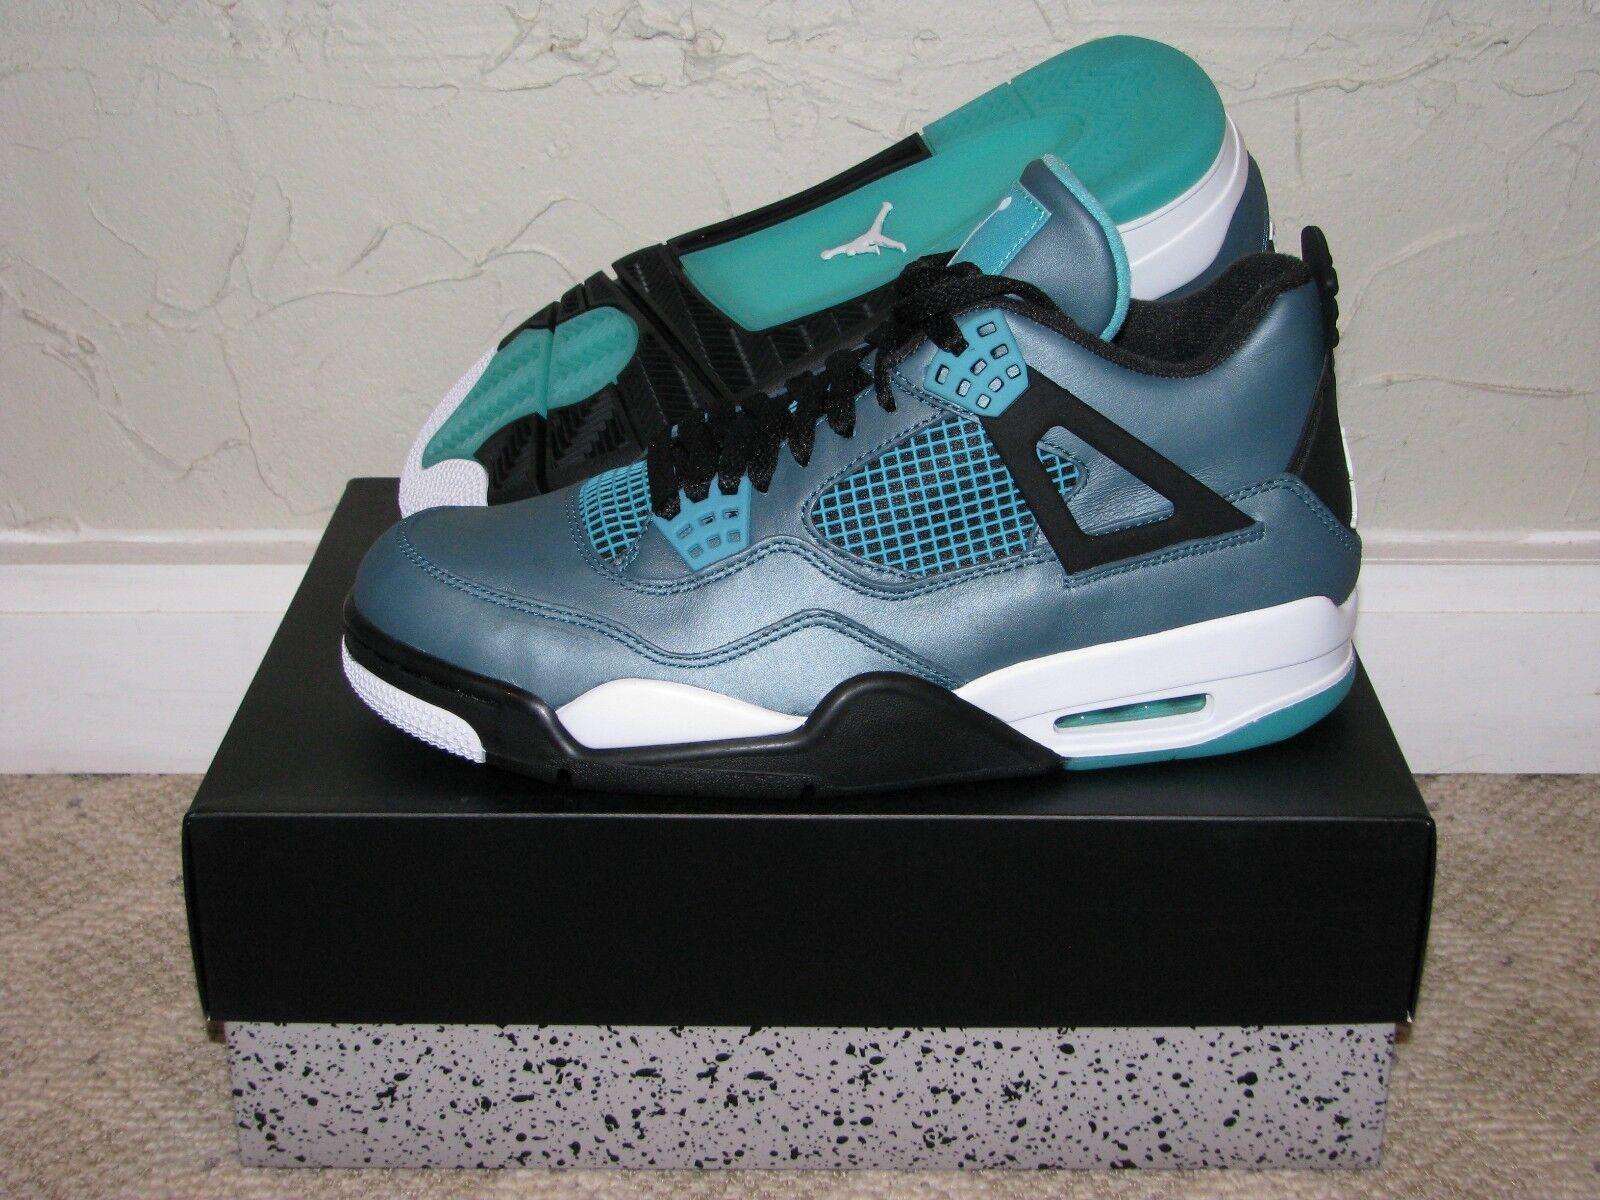 Nike Air Jordan Retro 4 IV Teal 30th Anniversary Mens Size 9.5 DS NEW! III VII